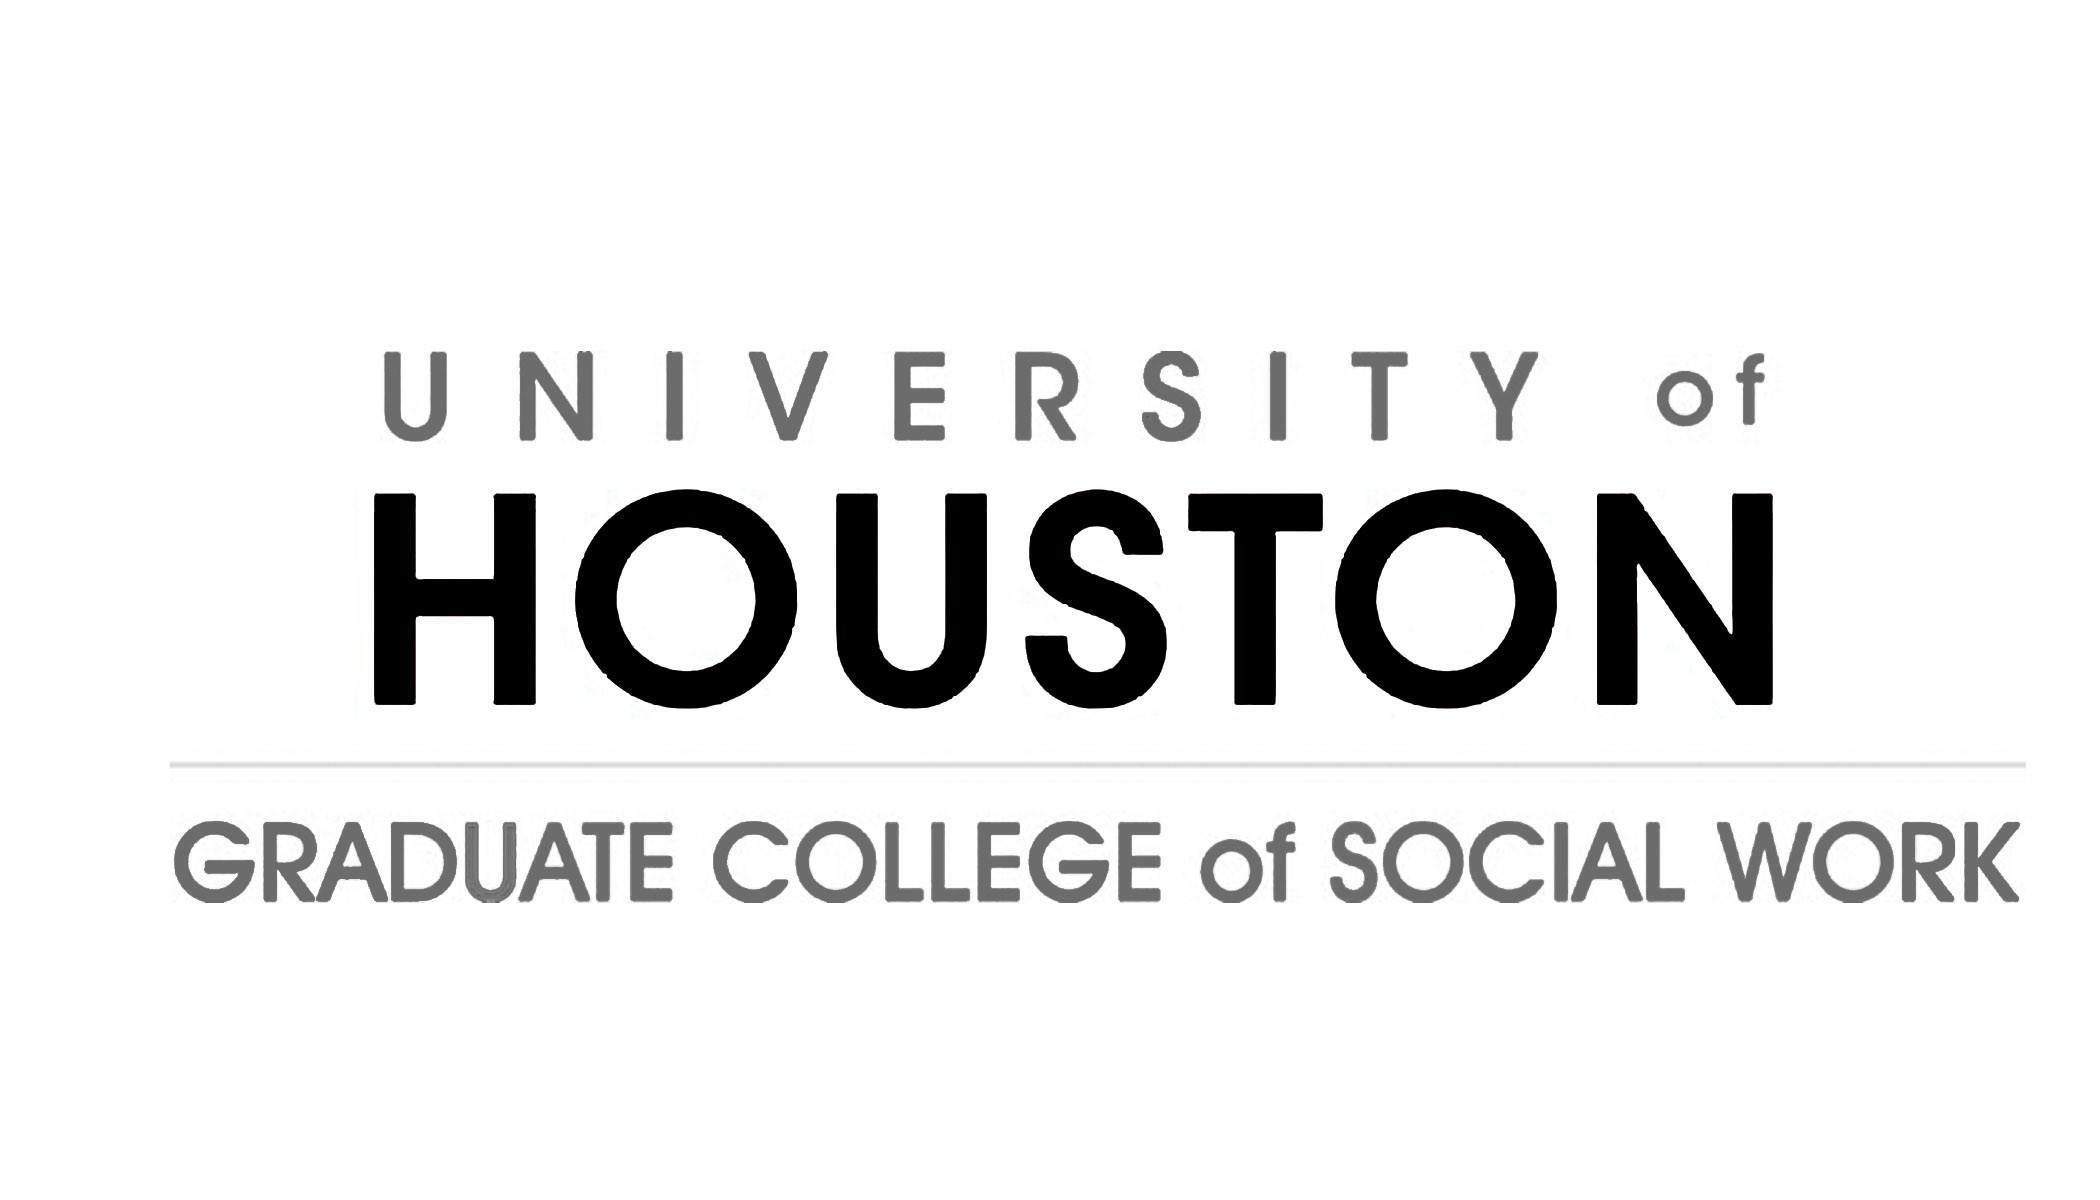 GCSW logo